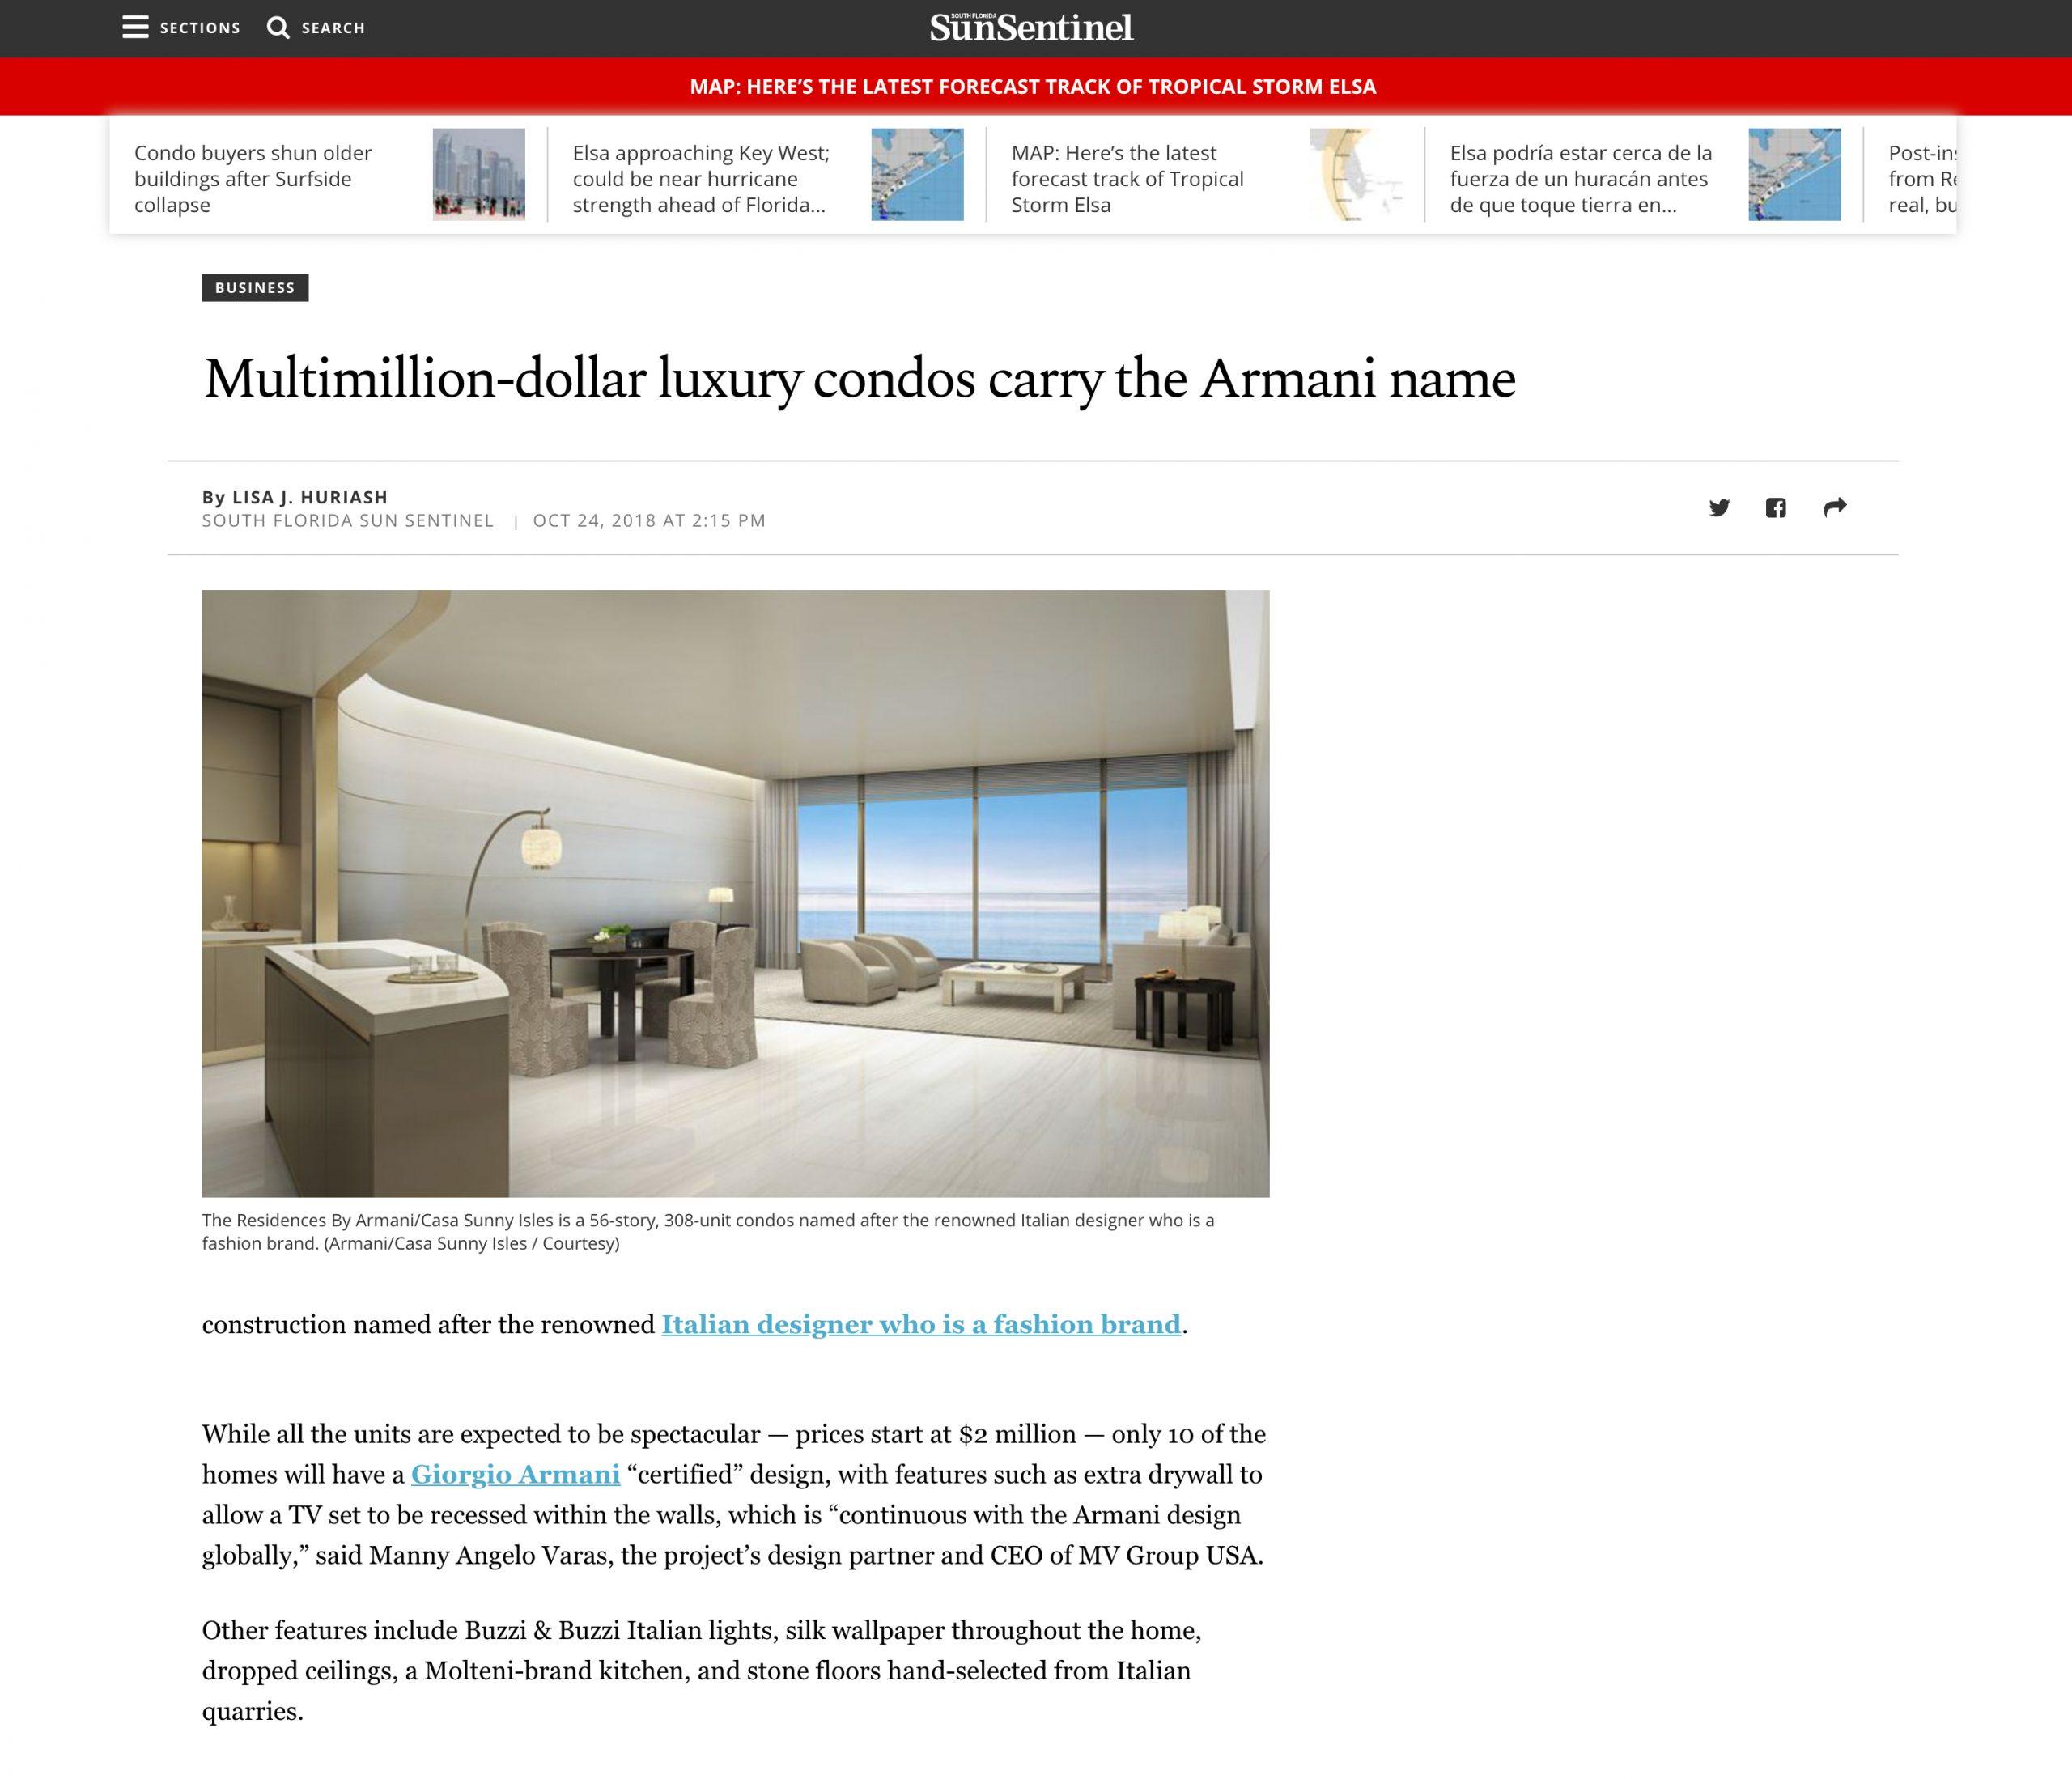 SunSentinel – Multimillion-dollar luxury condos carry the Armani name